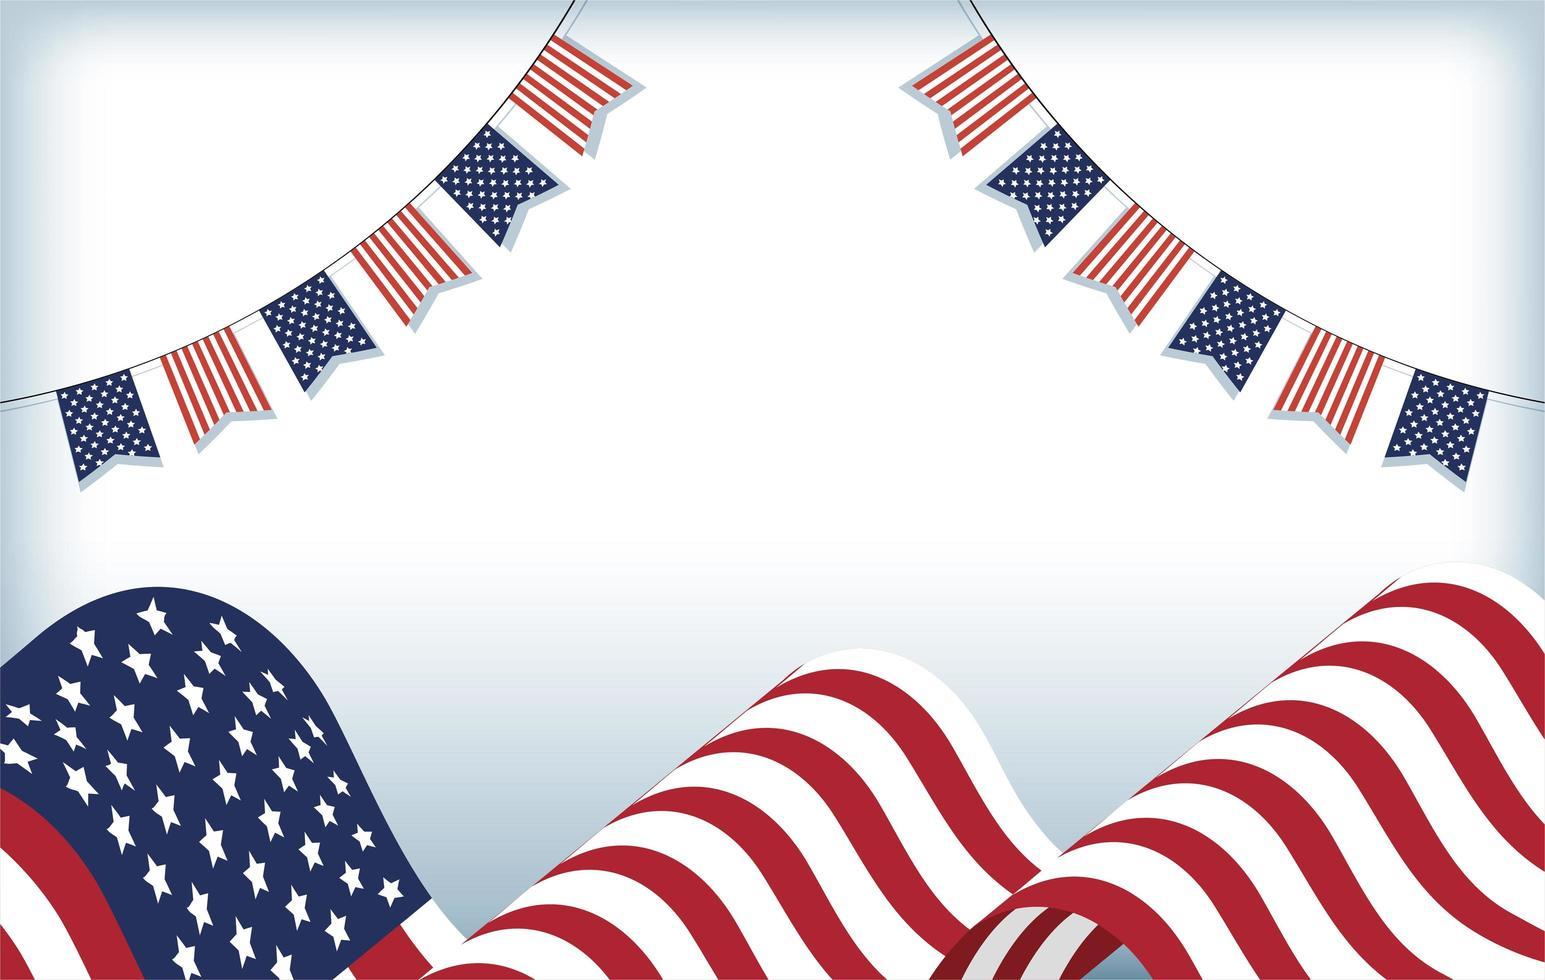 desenho de vetor de flâmula de bandeira e bandeira dos EUA